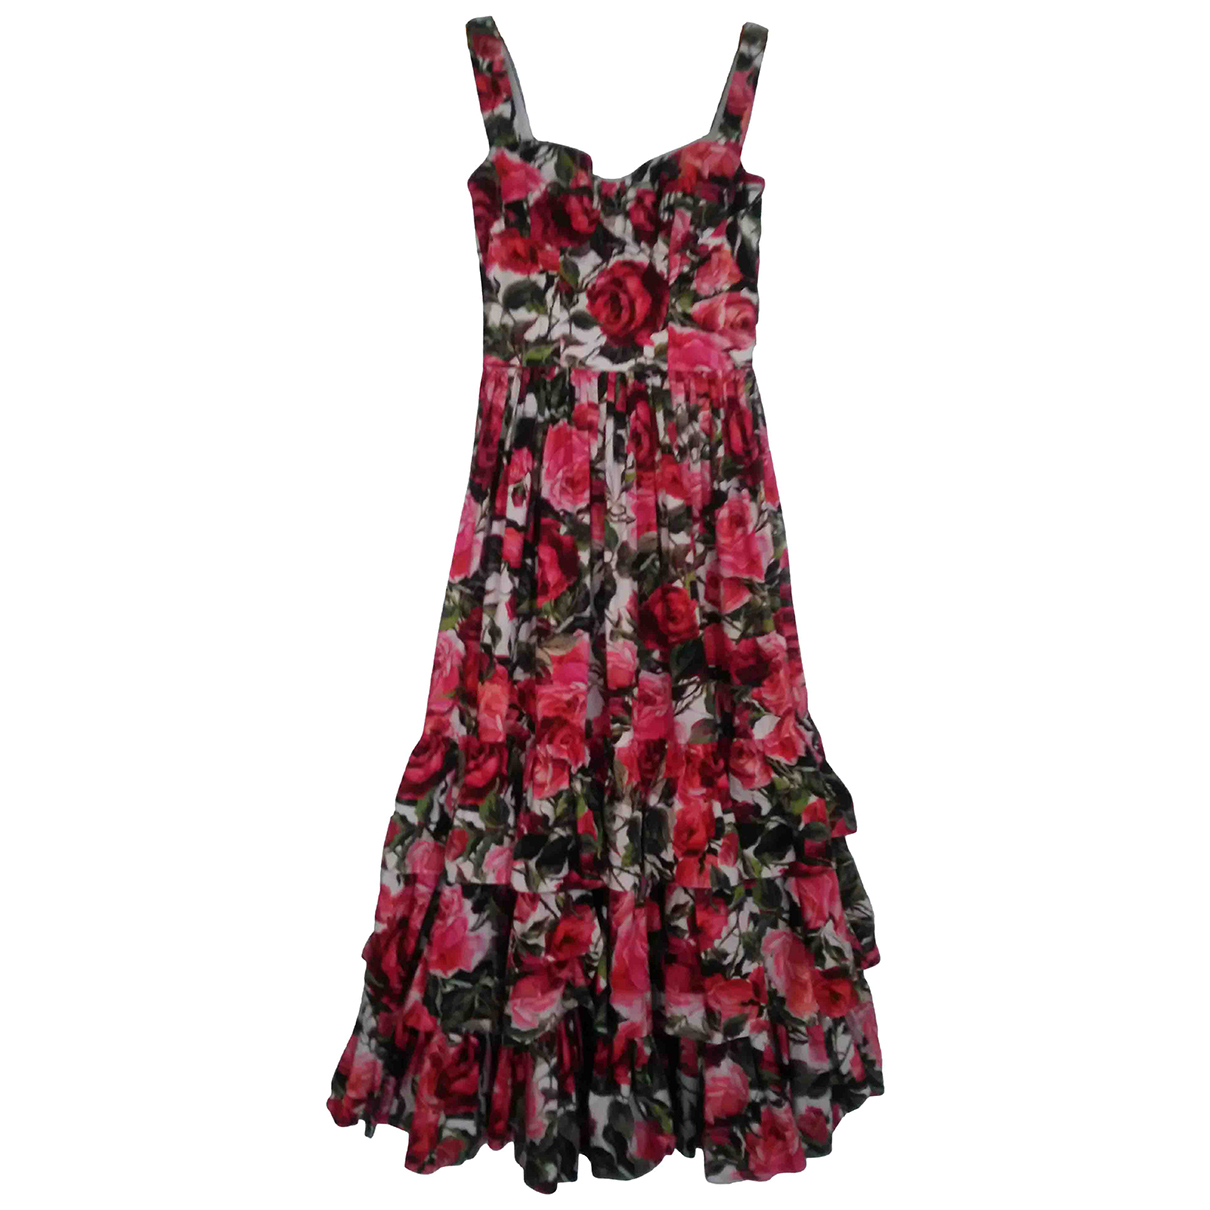 Dolce & Gabbana \N Kleid in  Bunt Baumwolle - Elasthan